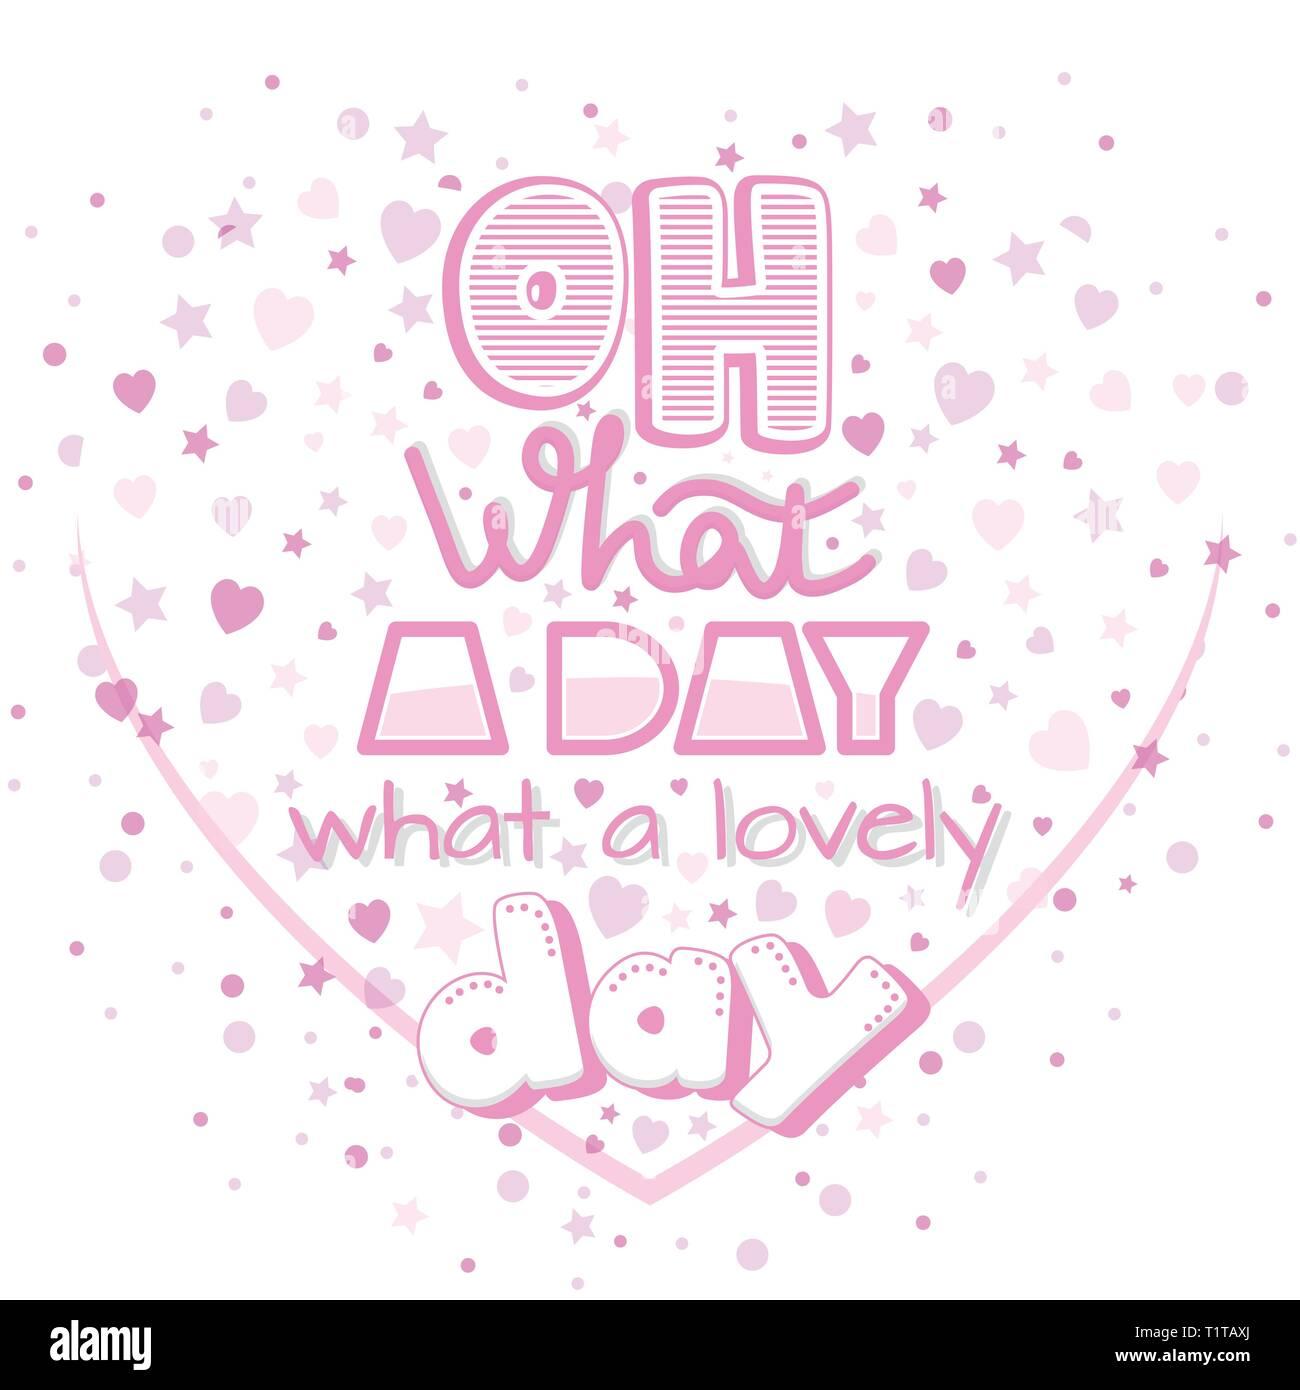 San Valentín Tipografía Dibujada A Mano Poster Motivacional